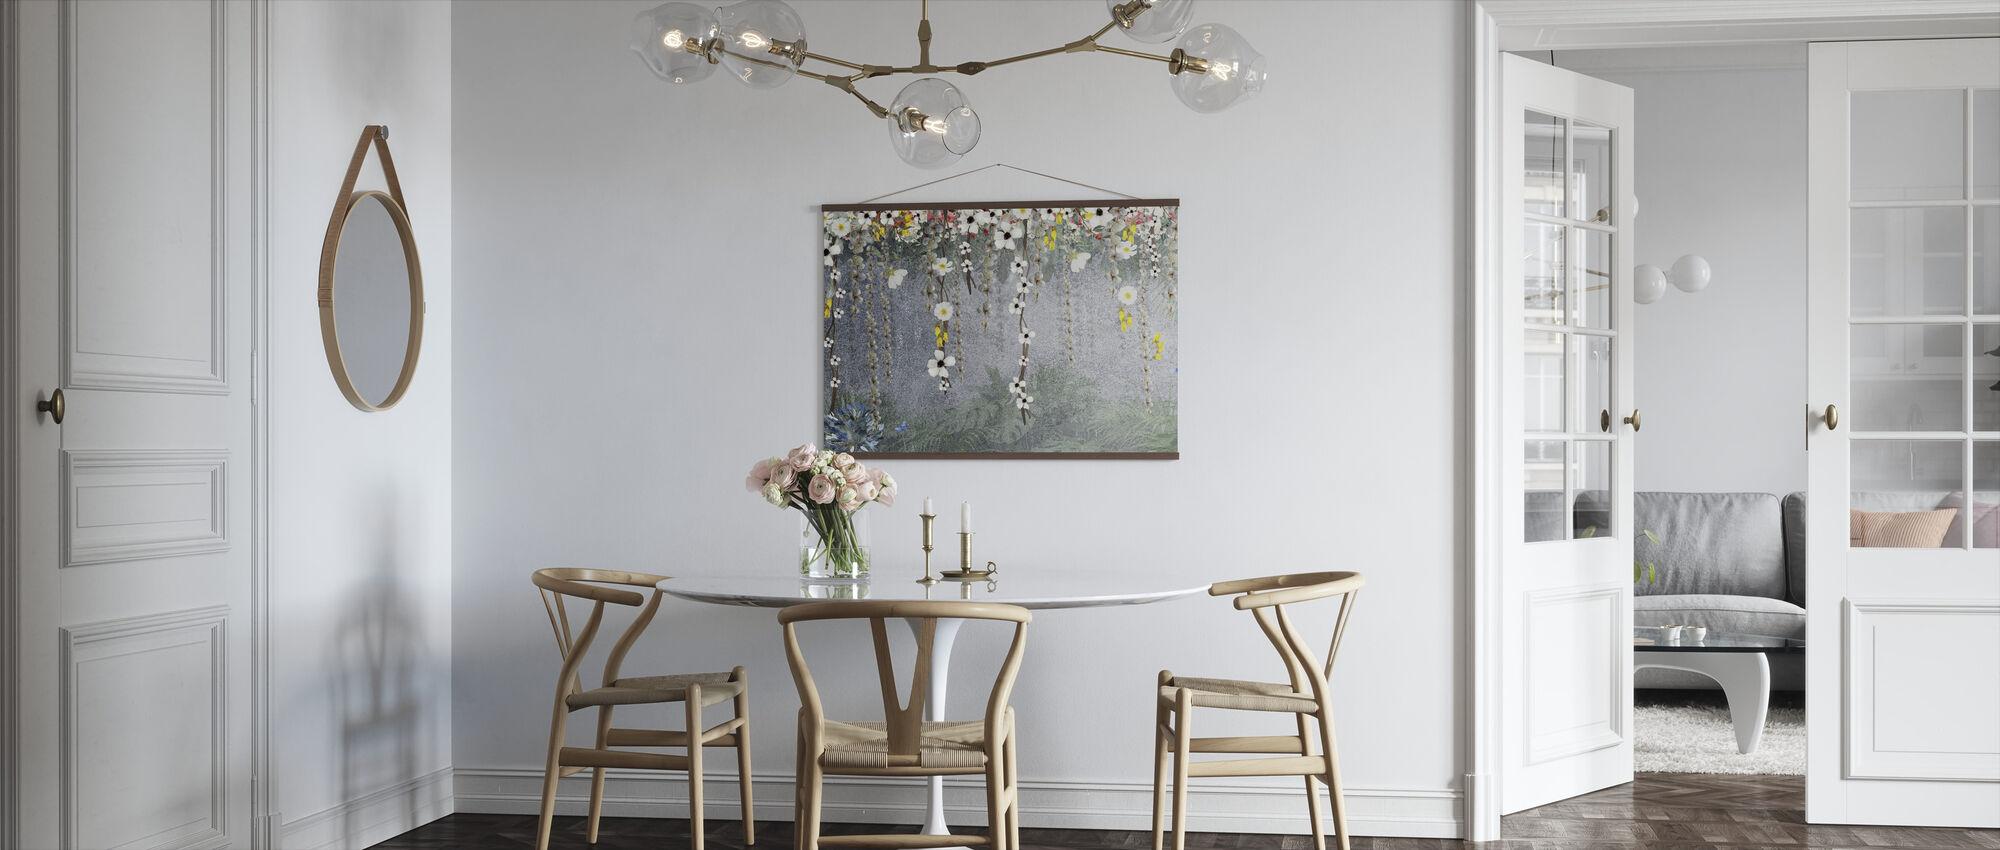 Pendent Blossom - Poster - Kitchen